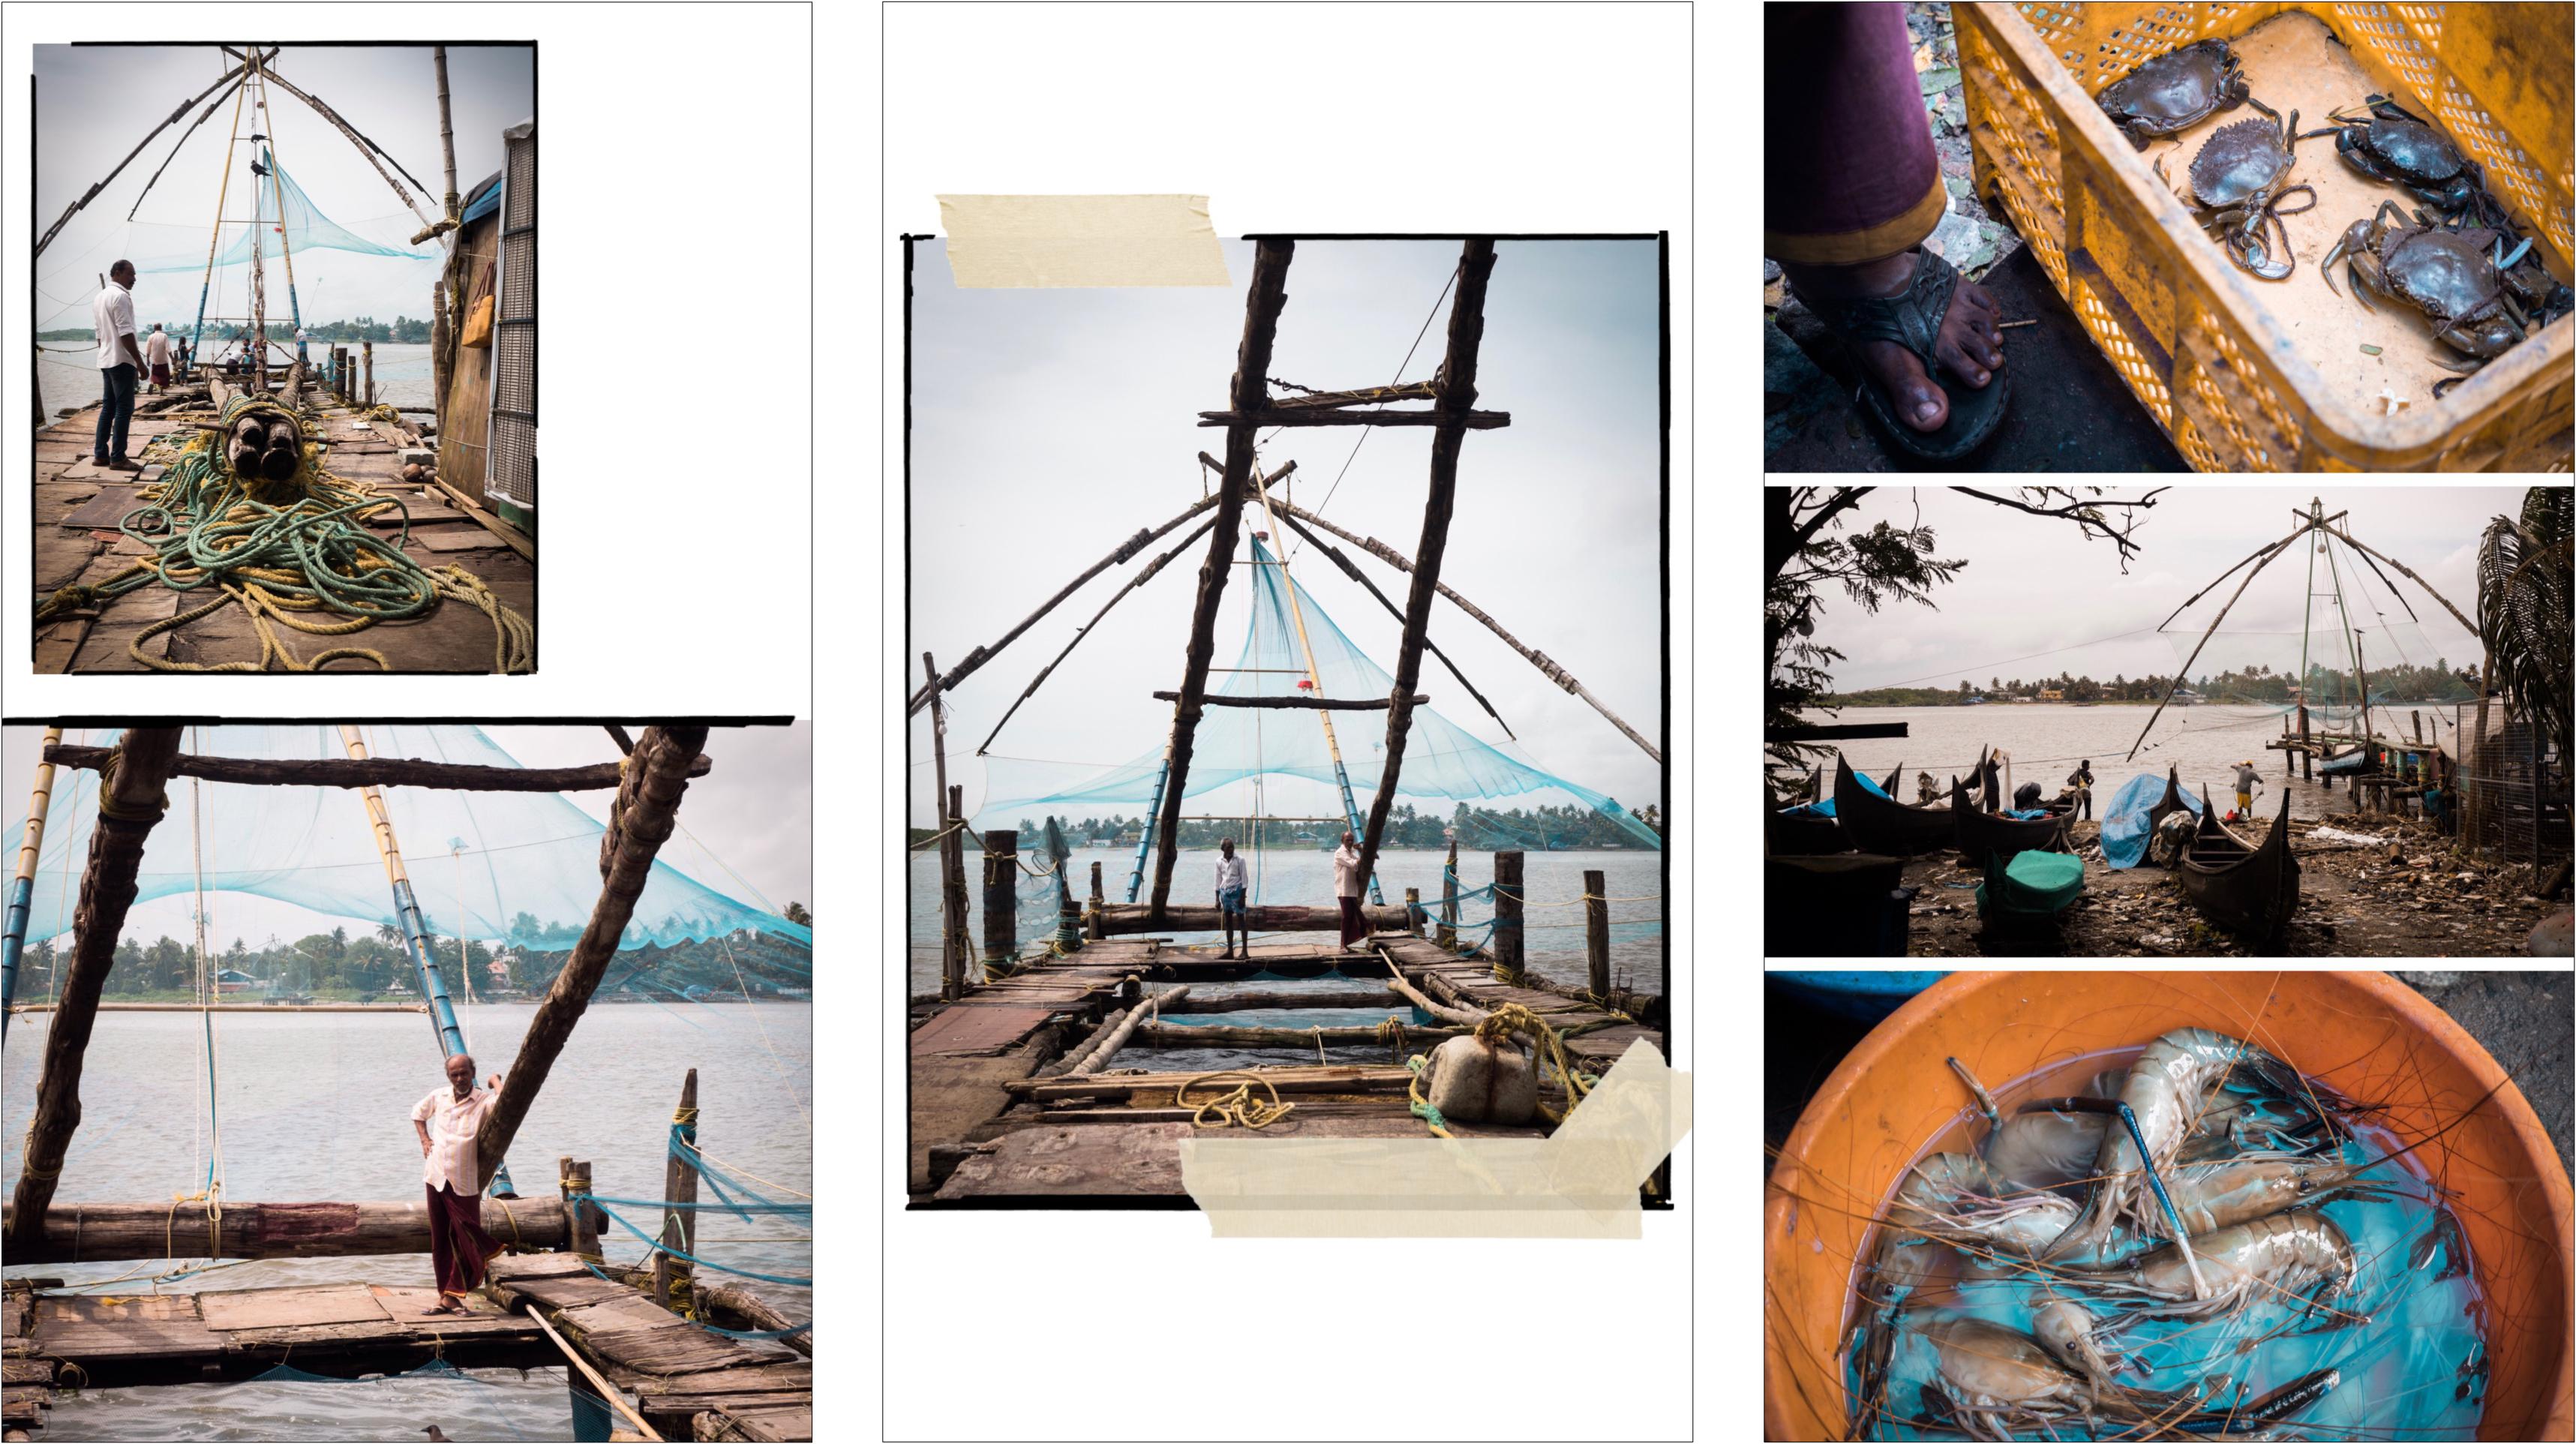 voyager au kerala - Kochi - fort Cochin - carrelets chinois